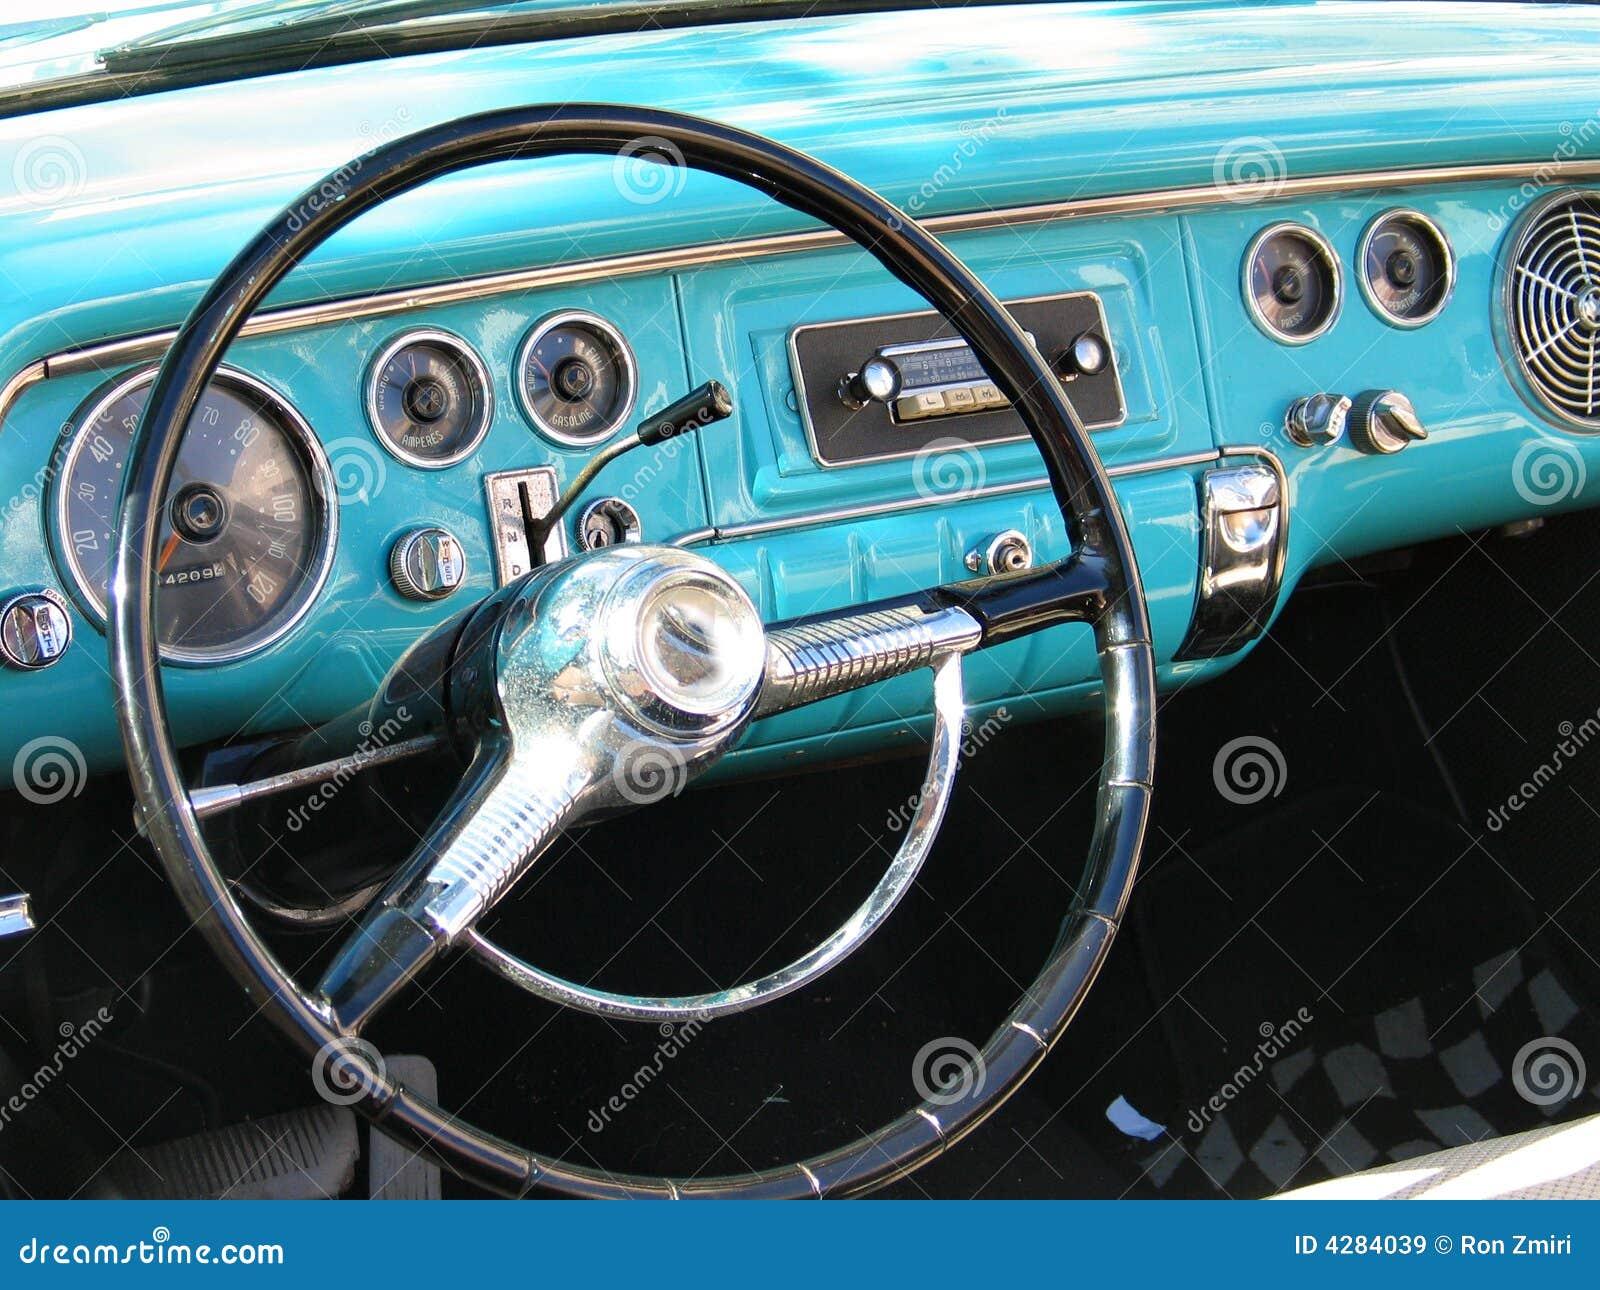 old classic car dashboard stock image image of sport 4284039. Black Bedroom Furniture Sets. Home Design Ideas